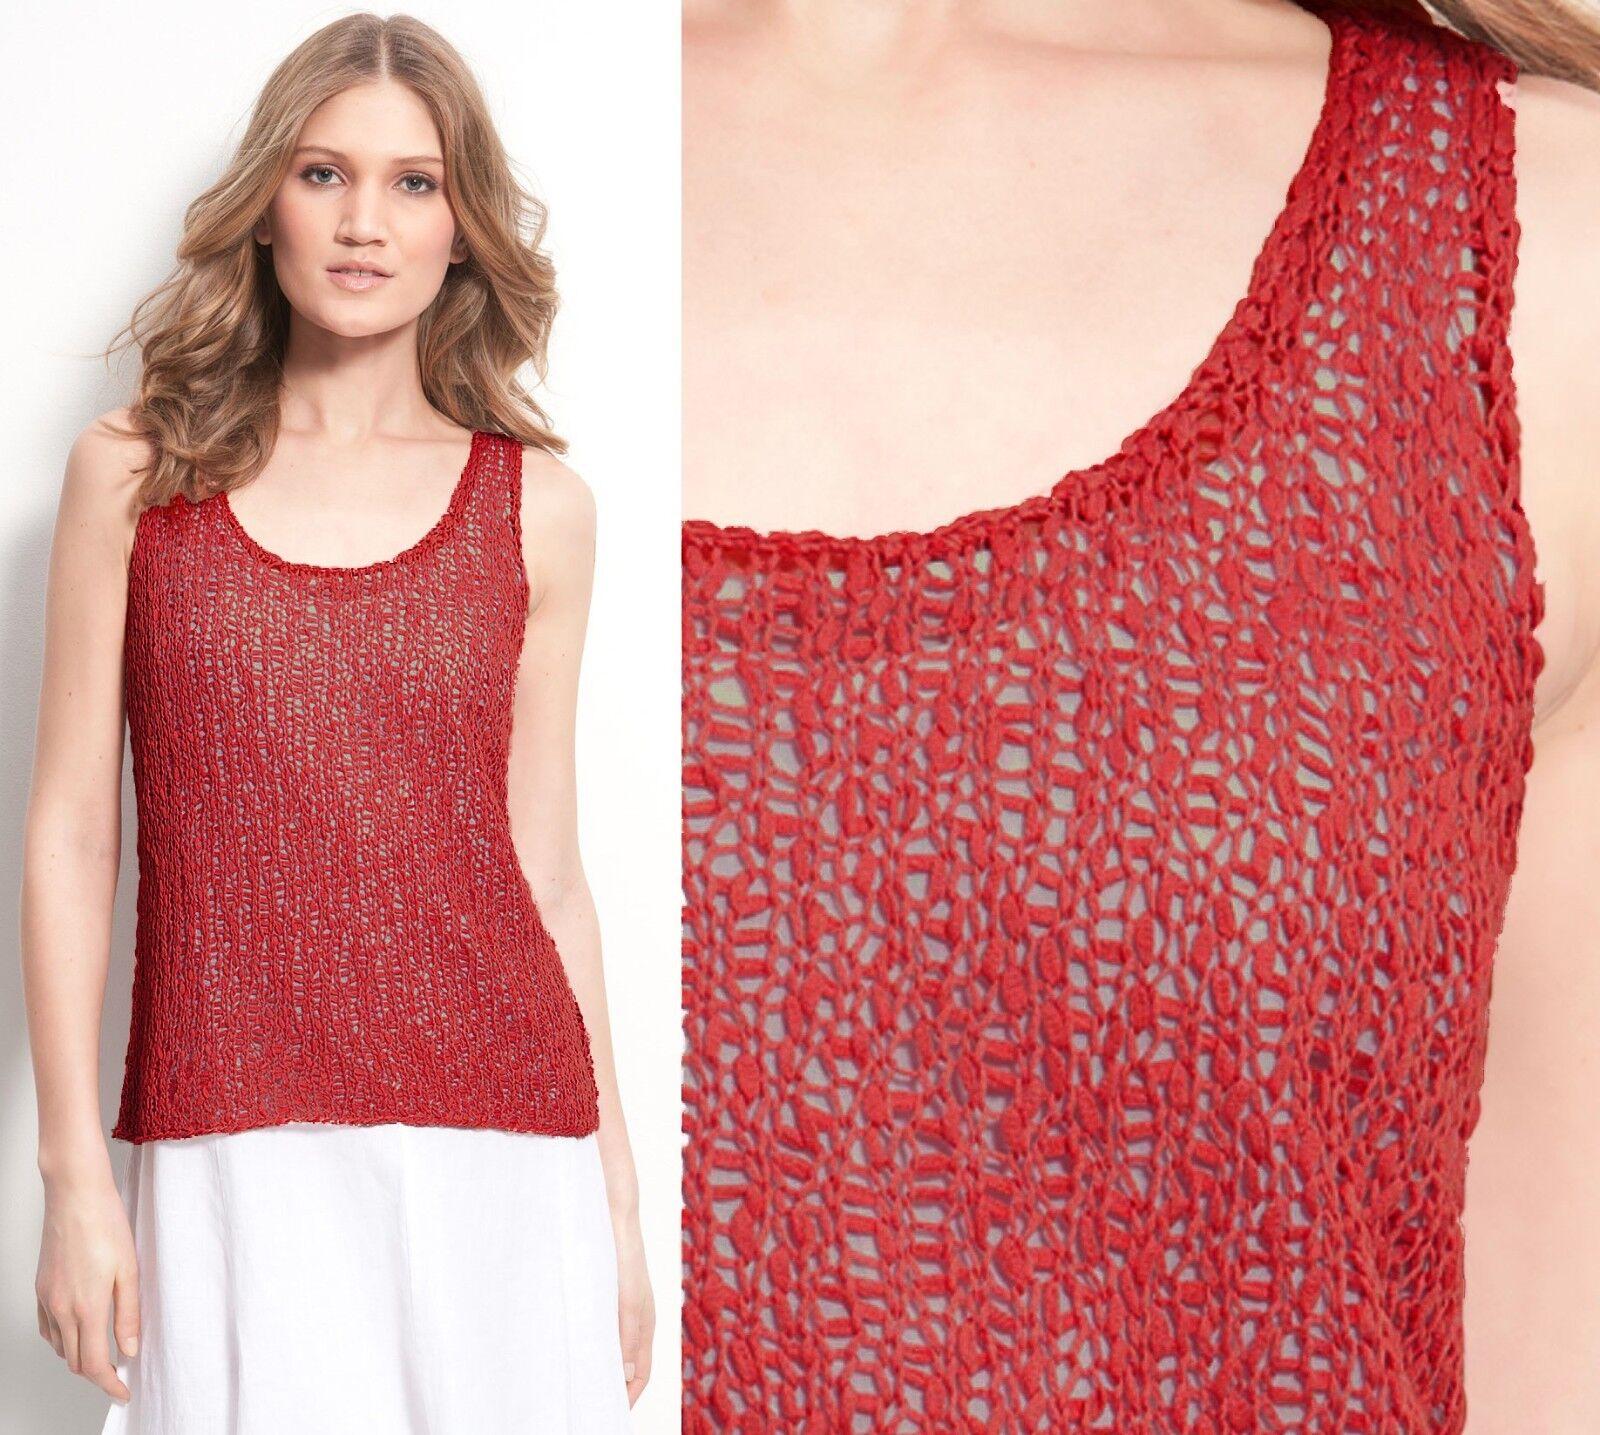 Eileen Fisher Cotton Tape Nubble U-Neck Strawberry rot Knit Tank Top